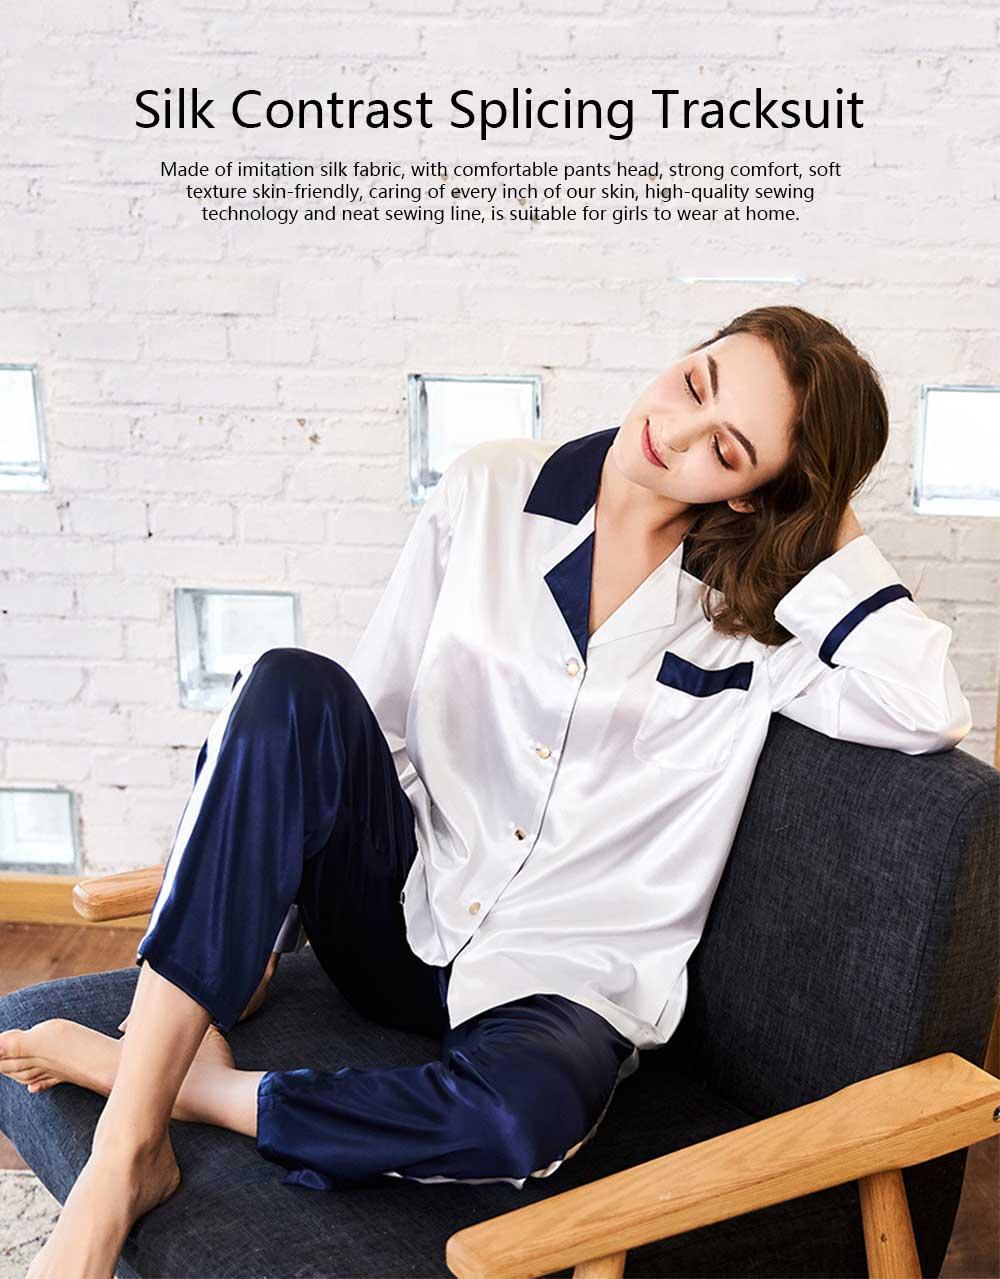 Classic Lapel Women's Long Sleeve Pajama 2 PCS Set, Imitation Silk Fabric Contrast Splicing Tracksuit 6